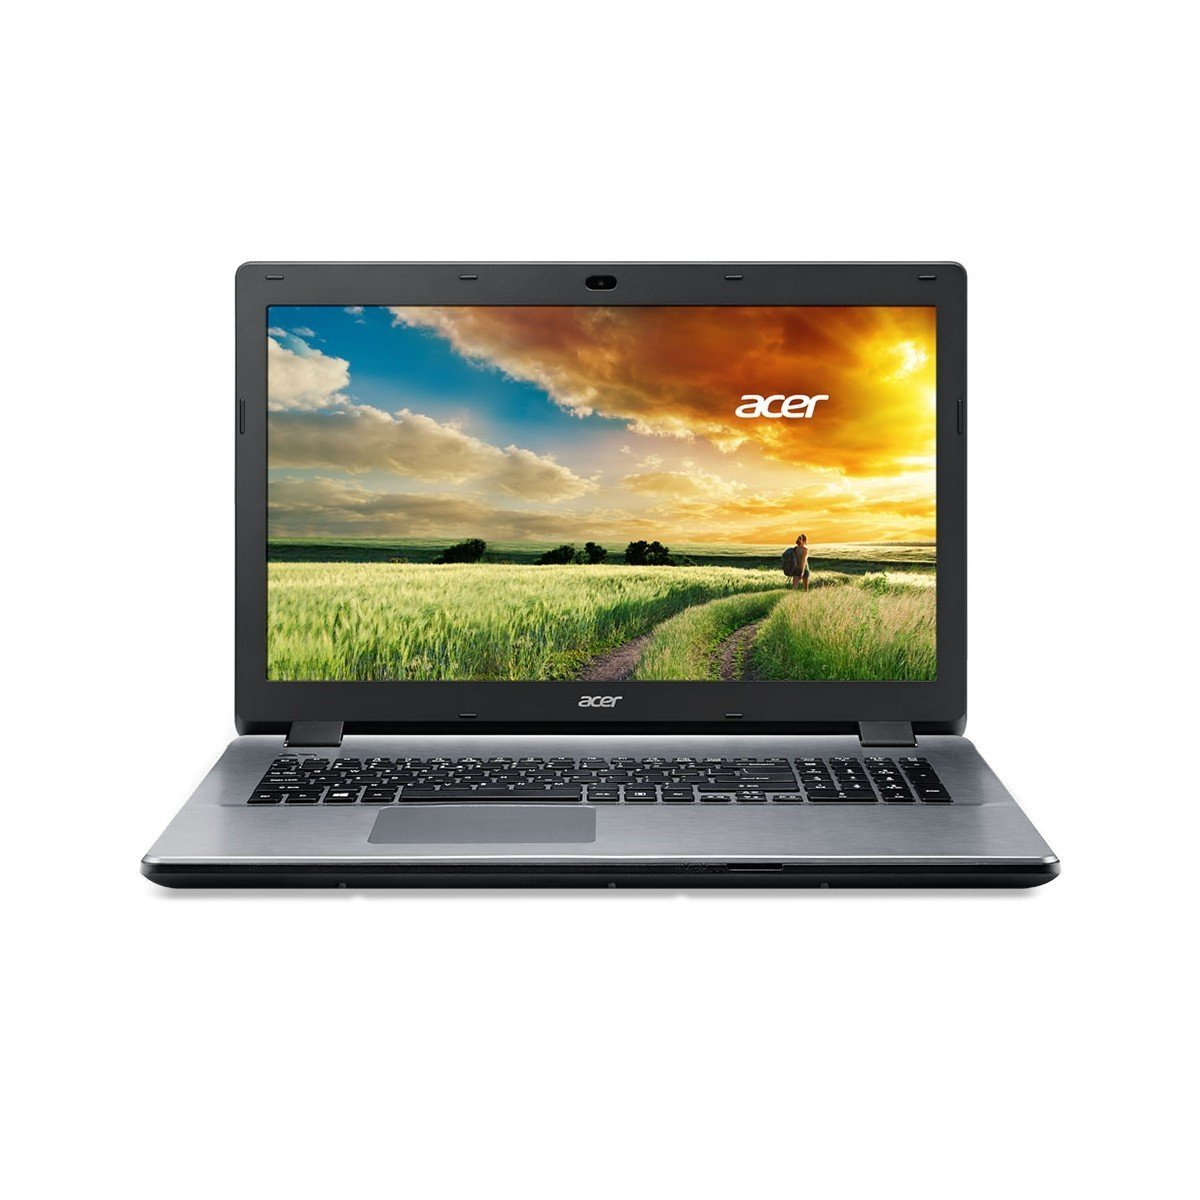 Acer NX.MNVEF.012 - PC portable Acer - Cybertek.fr - 0